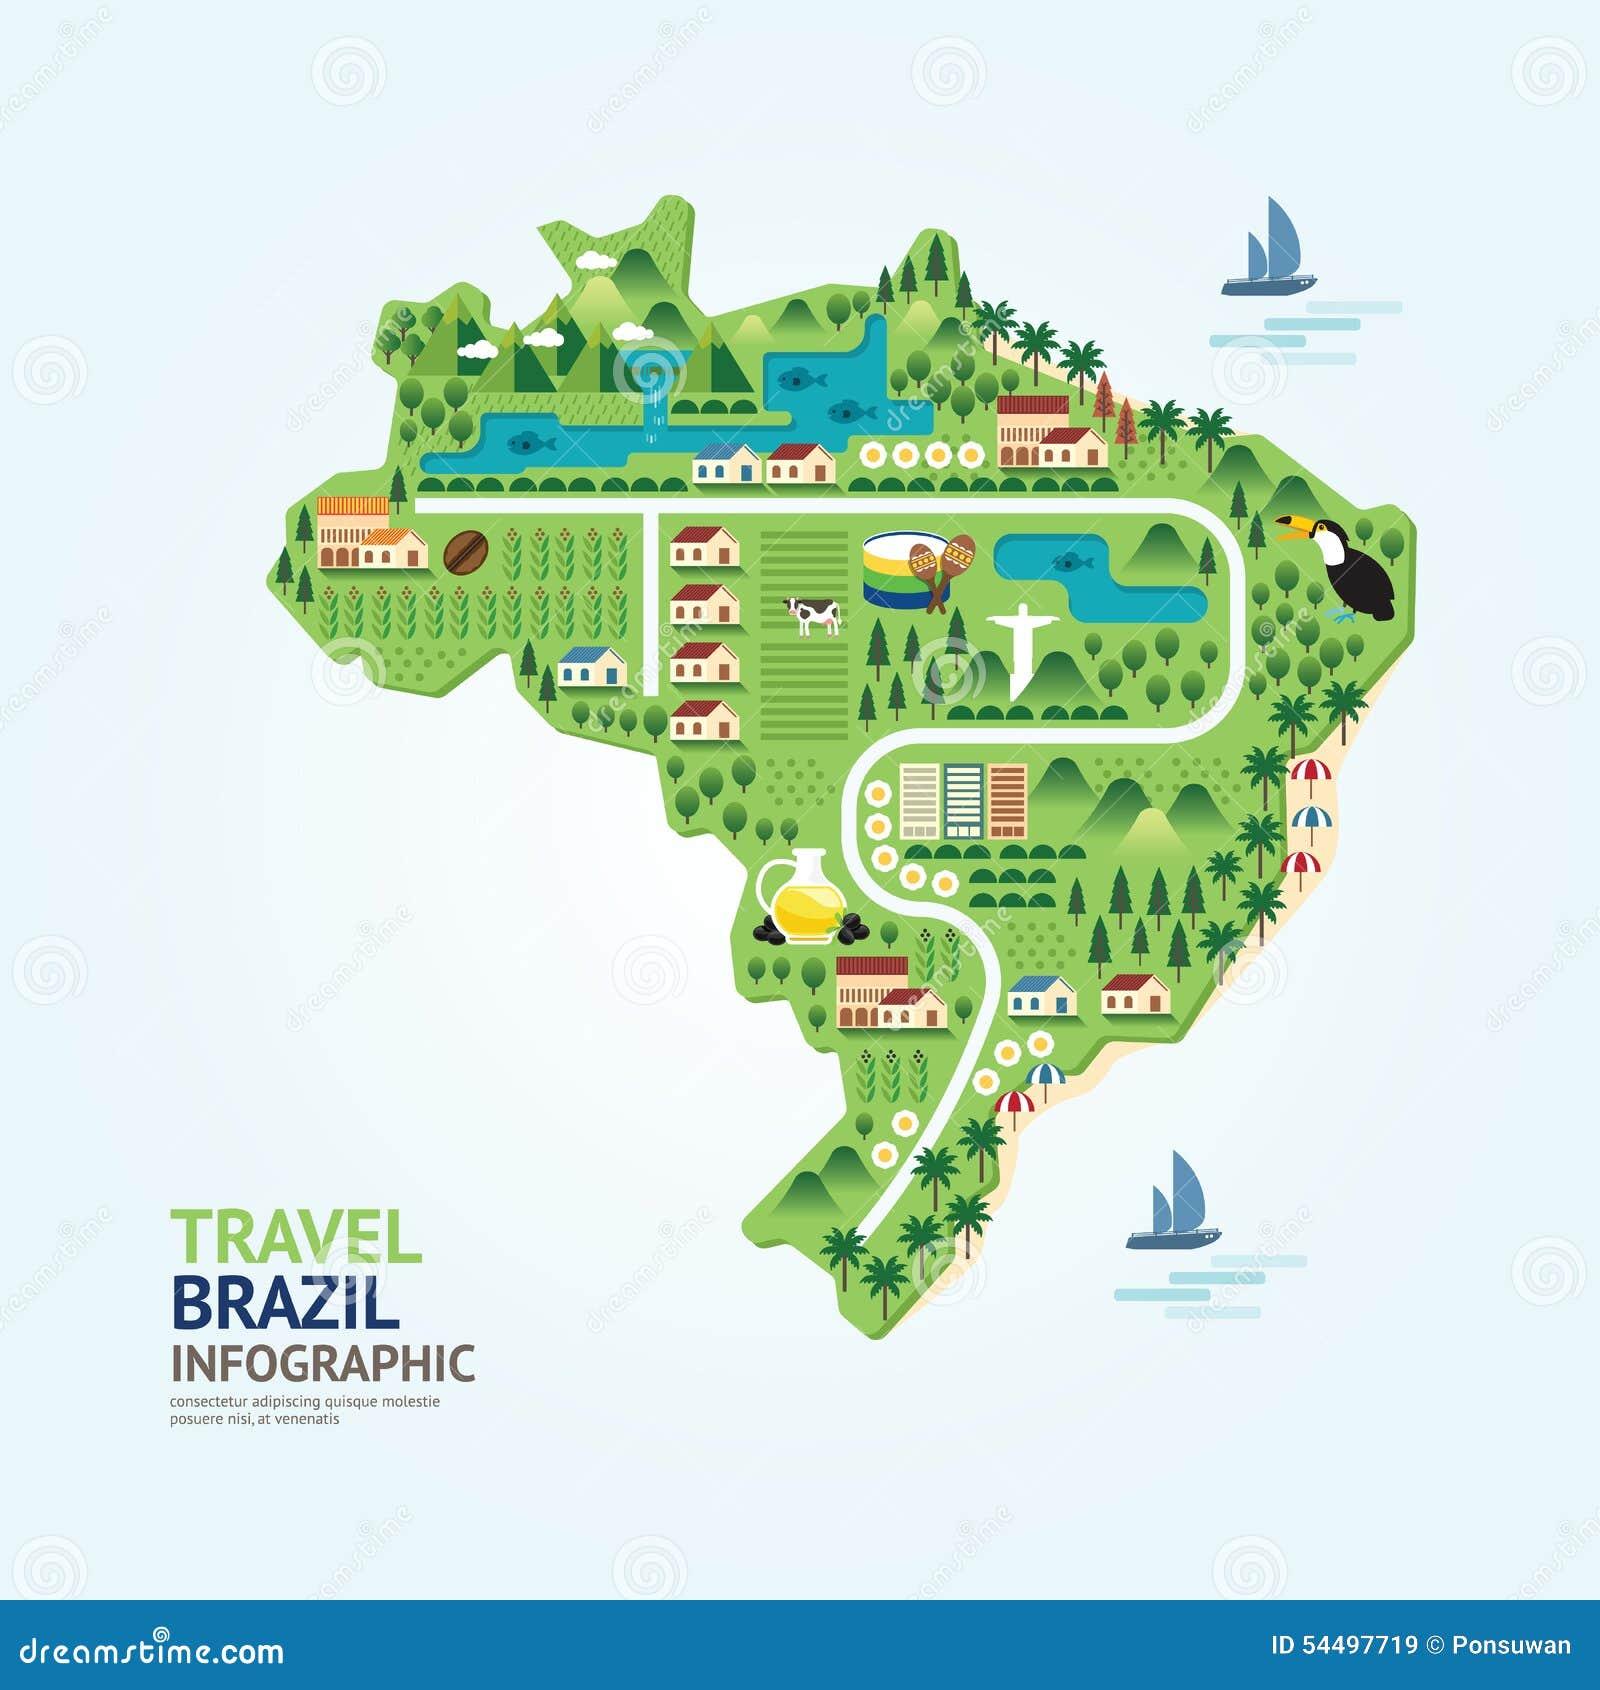 Infographic Travel And Landmark Argentina Map Shape Template Des - Argentina map shape